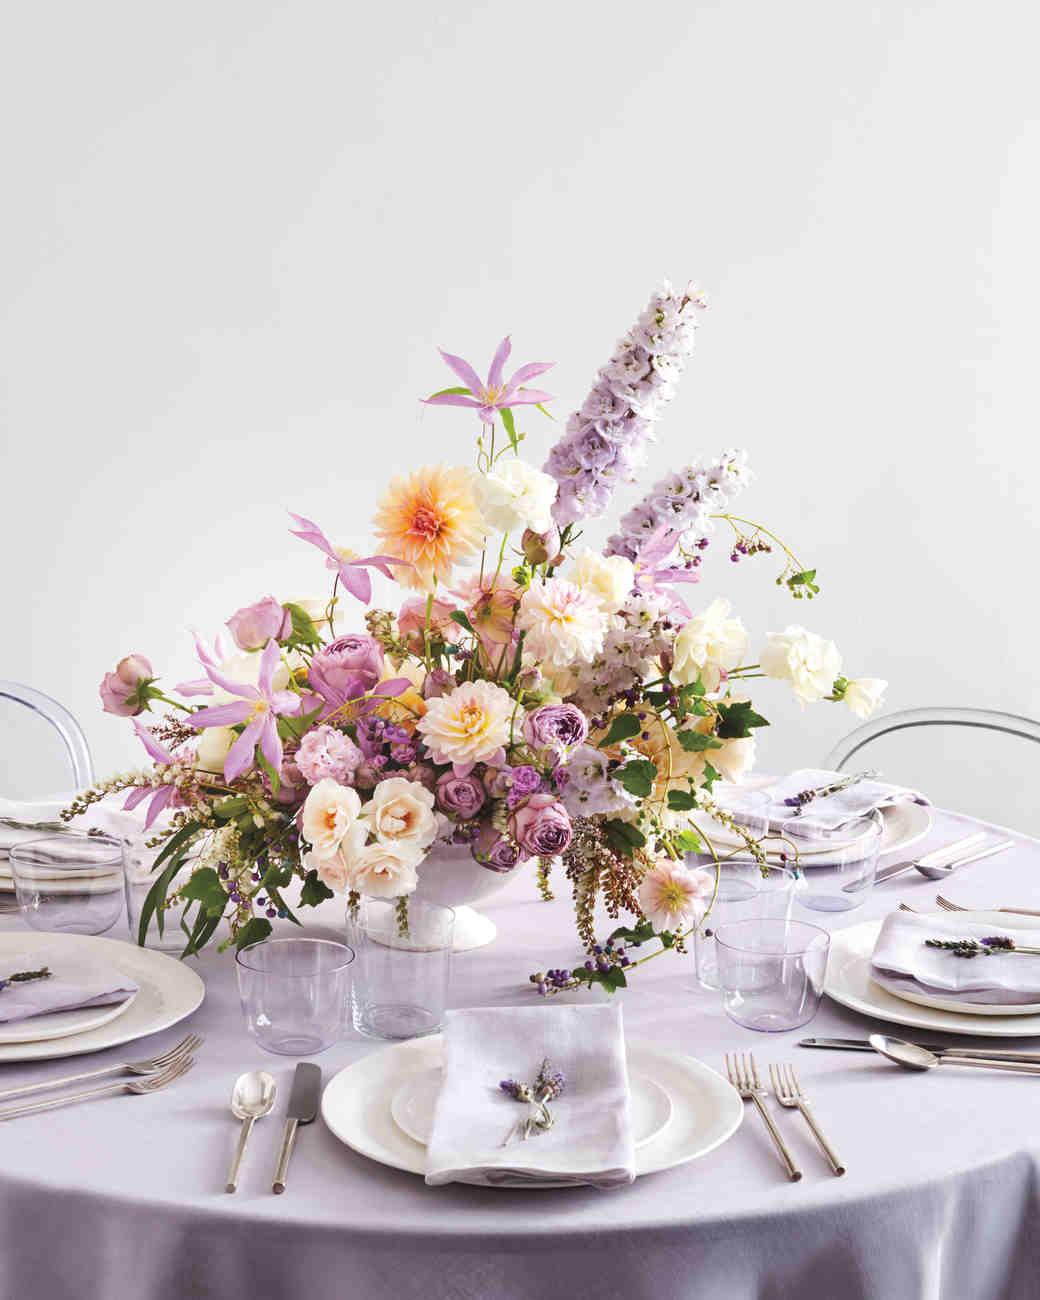 Best ideas about DIY Wedding Floral Centerpieces . Save or Pin 23 DIY Wedding Centerpieces We Love Now.